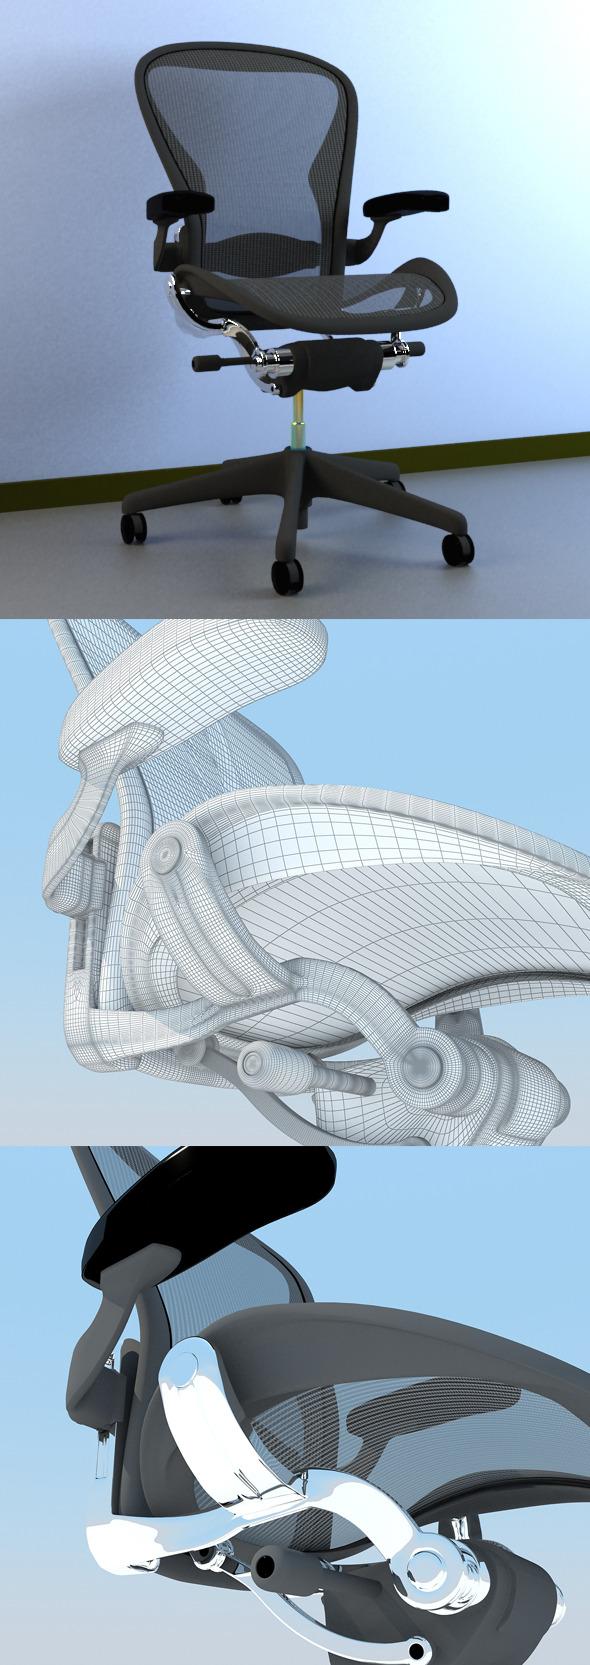 3DOcean Aeron Work Chair Herman Miller MAX 2011 4989792